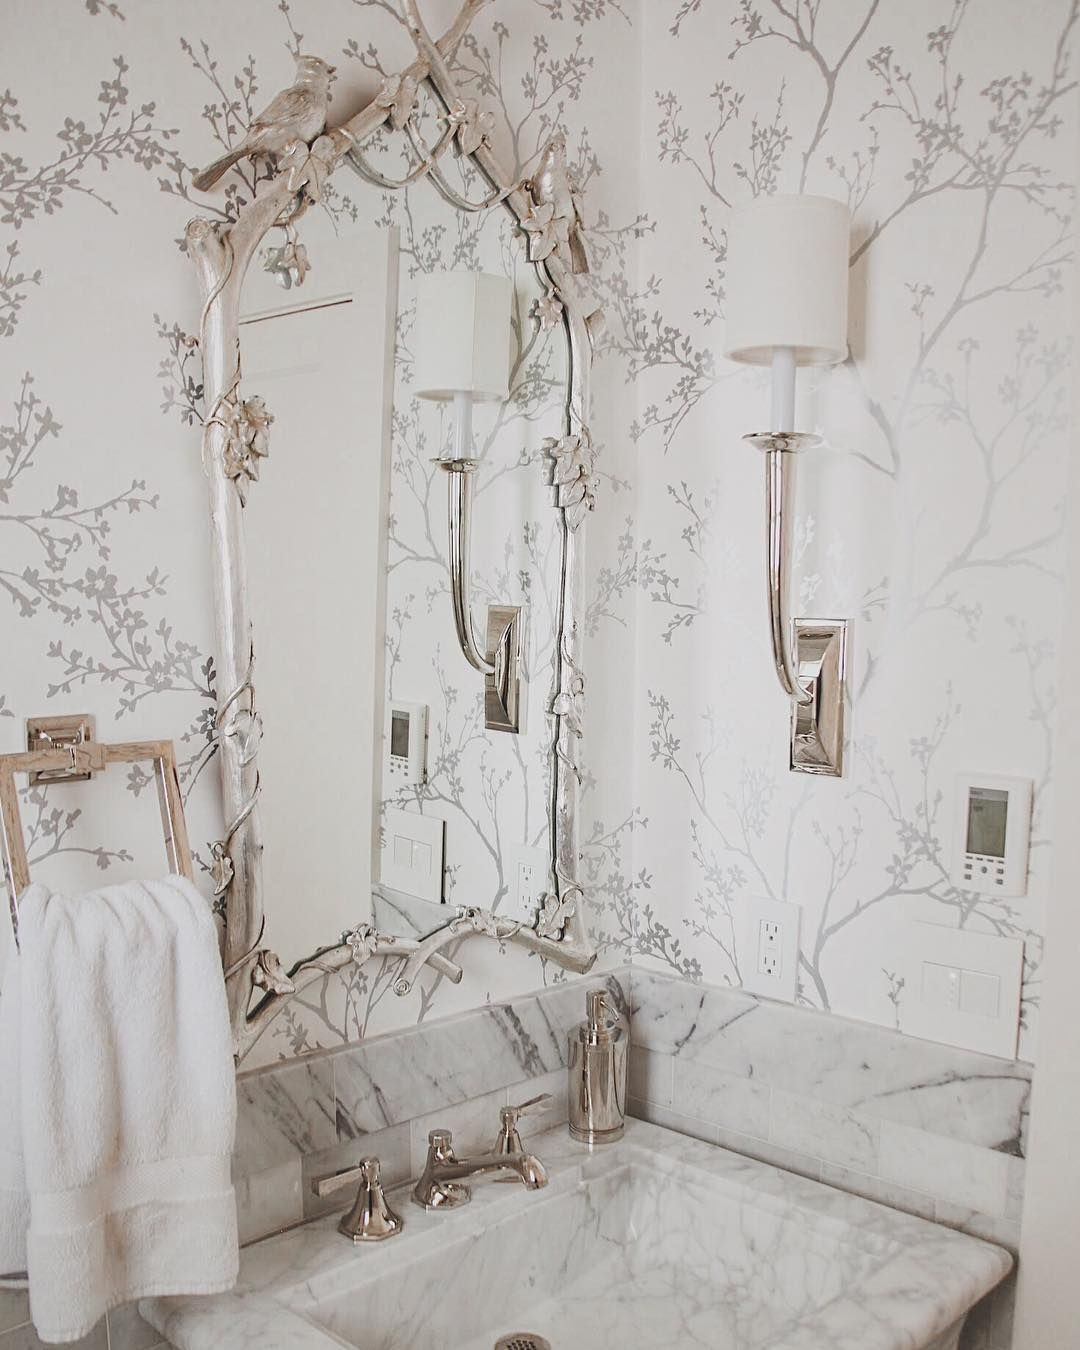 Doran taylor interior design doran taylor inc pinterest